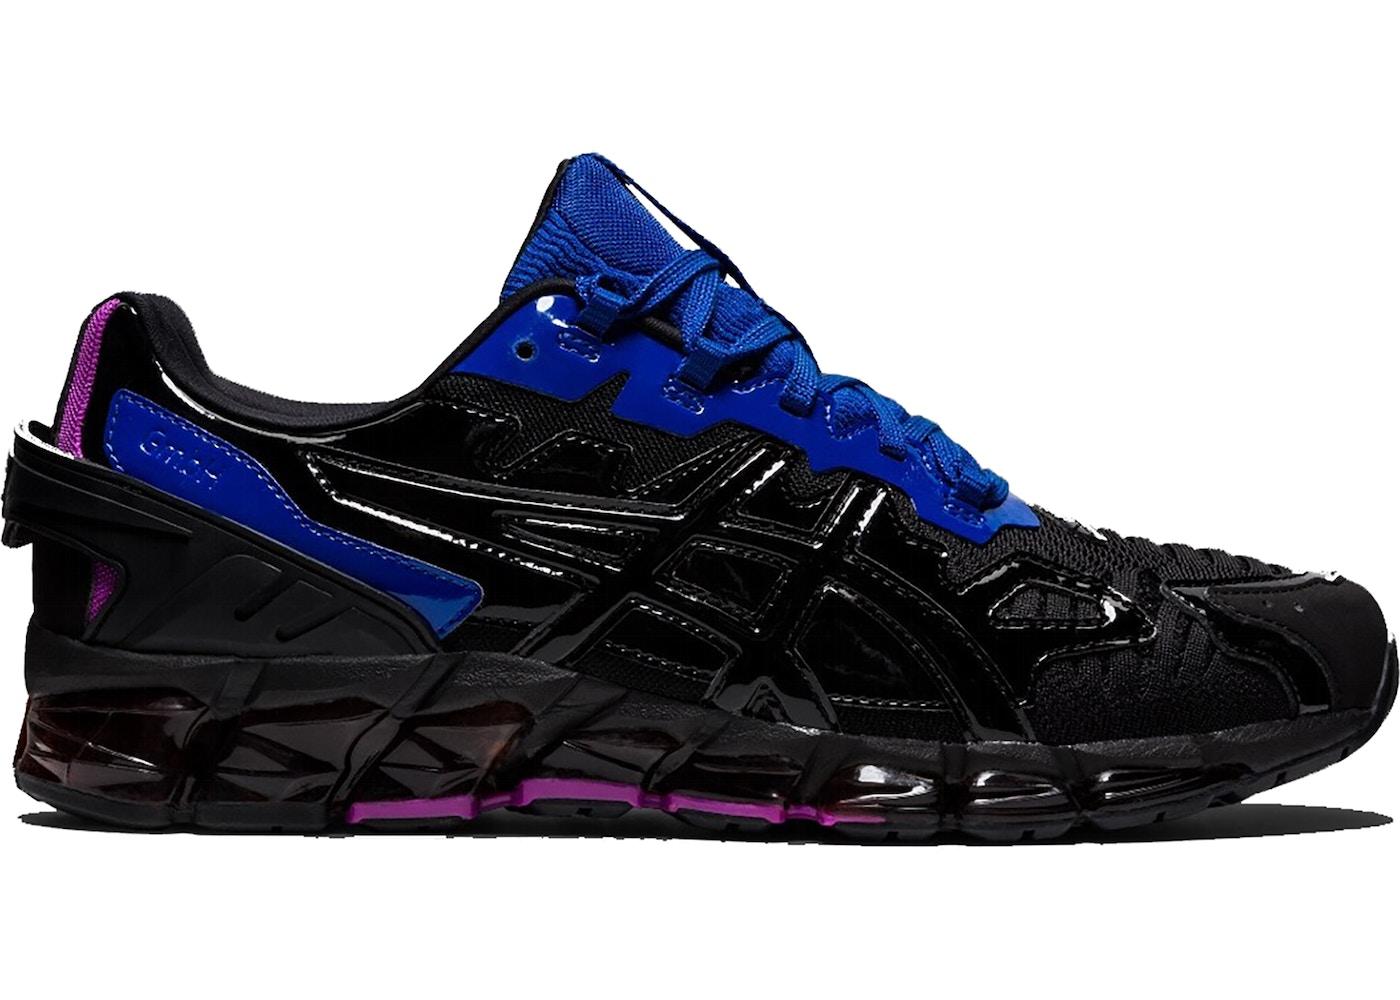 ASICS Gel-Quantum 360 6 GmbH Orchid Black - Sneakers